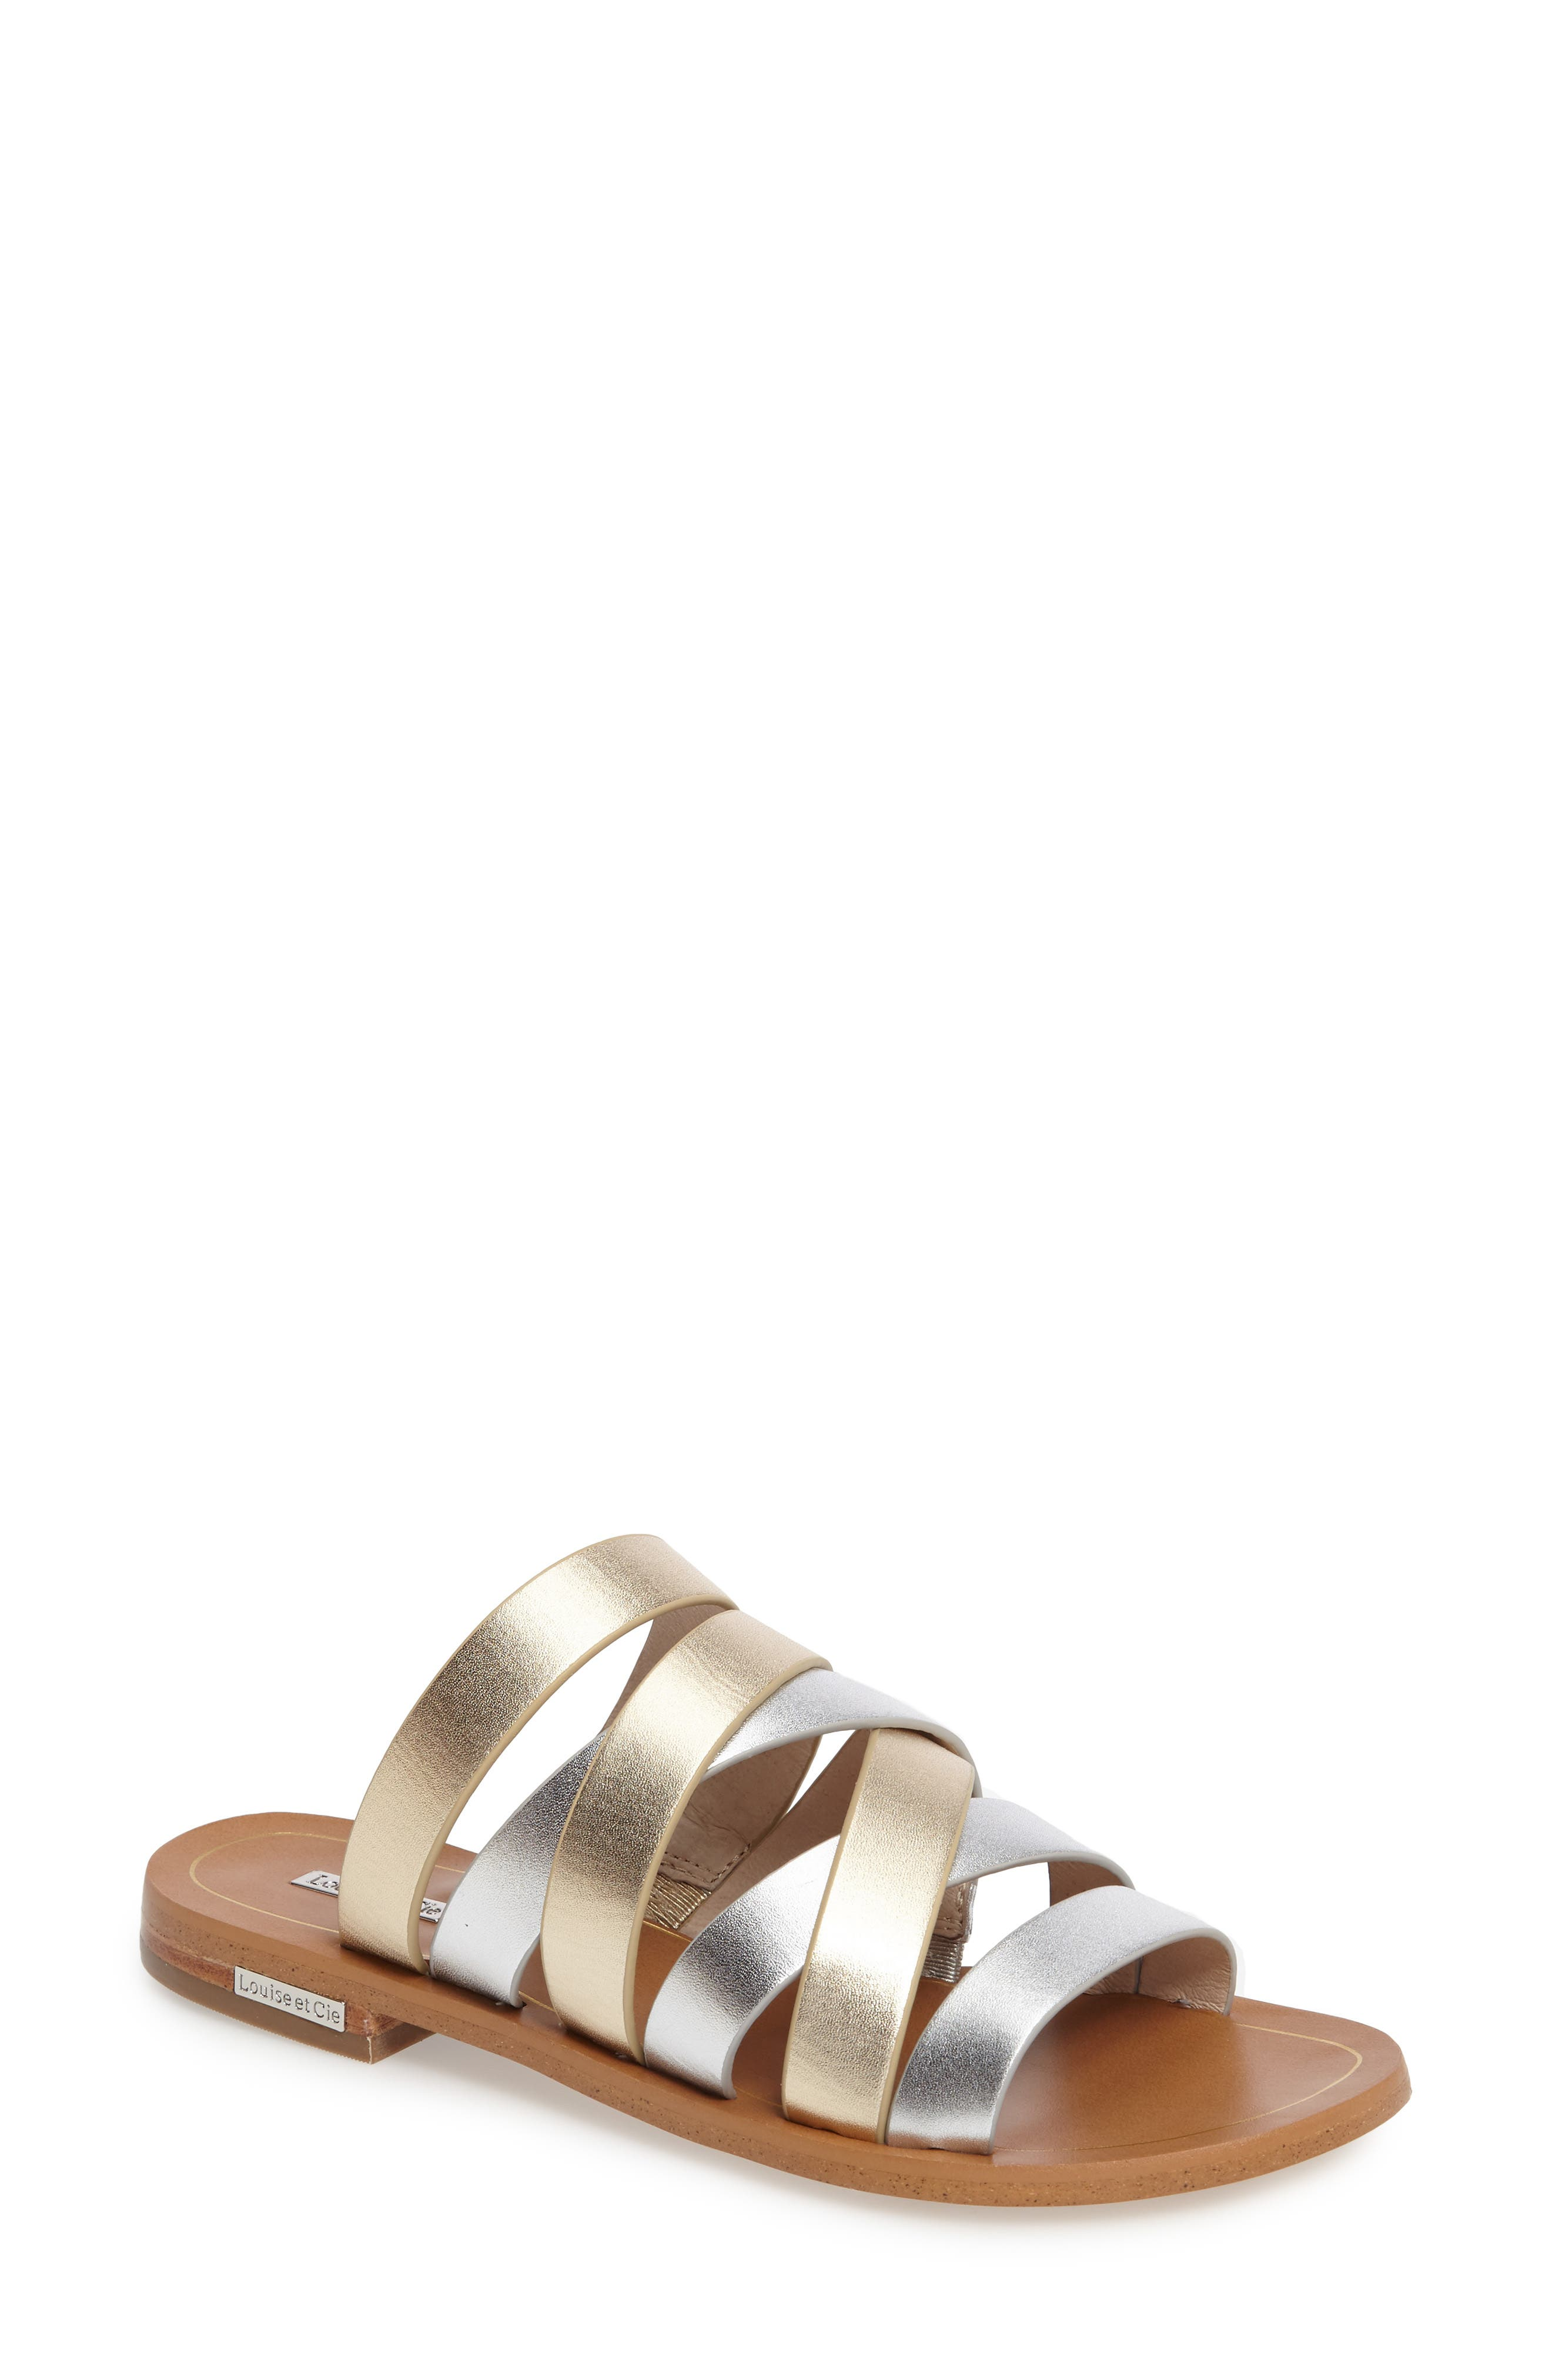 Braelynn Slide Sandal,                         Main,                         color, Sterling Leather